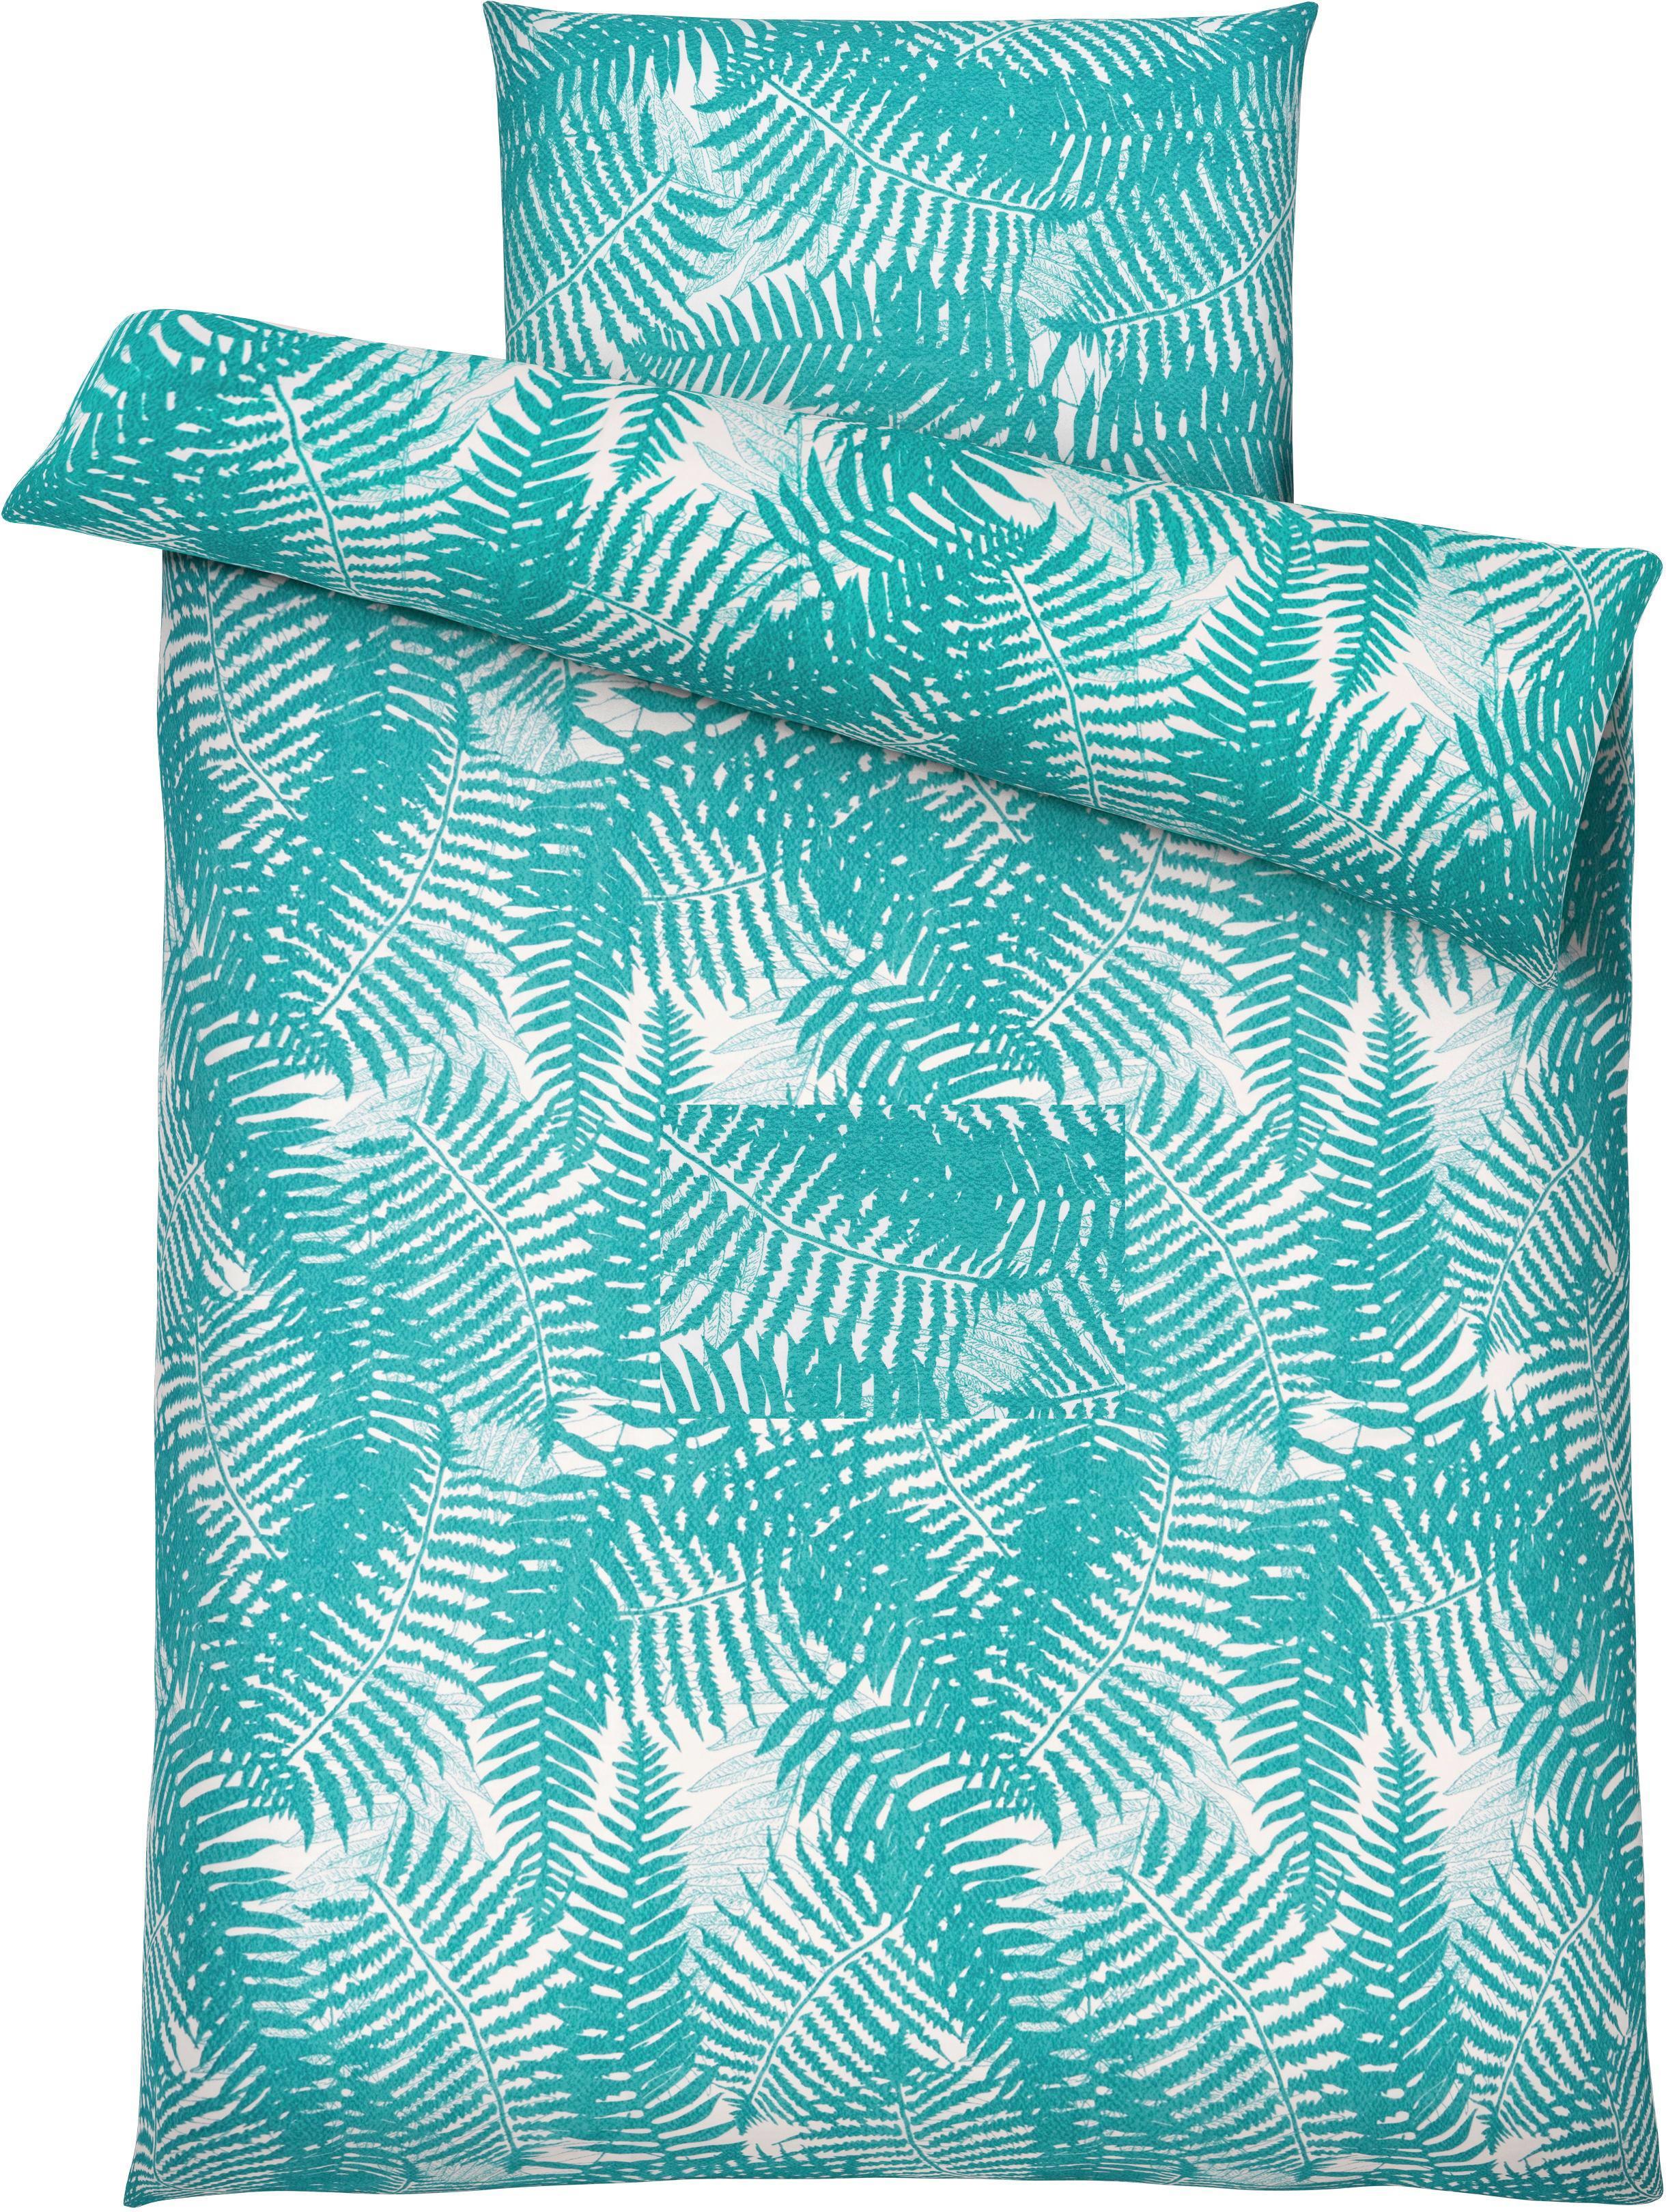 Bettwäsche Bibiana ca. 135x200cm - Türkis, Textil (135/200cm) - MÖMAX modern living